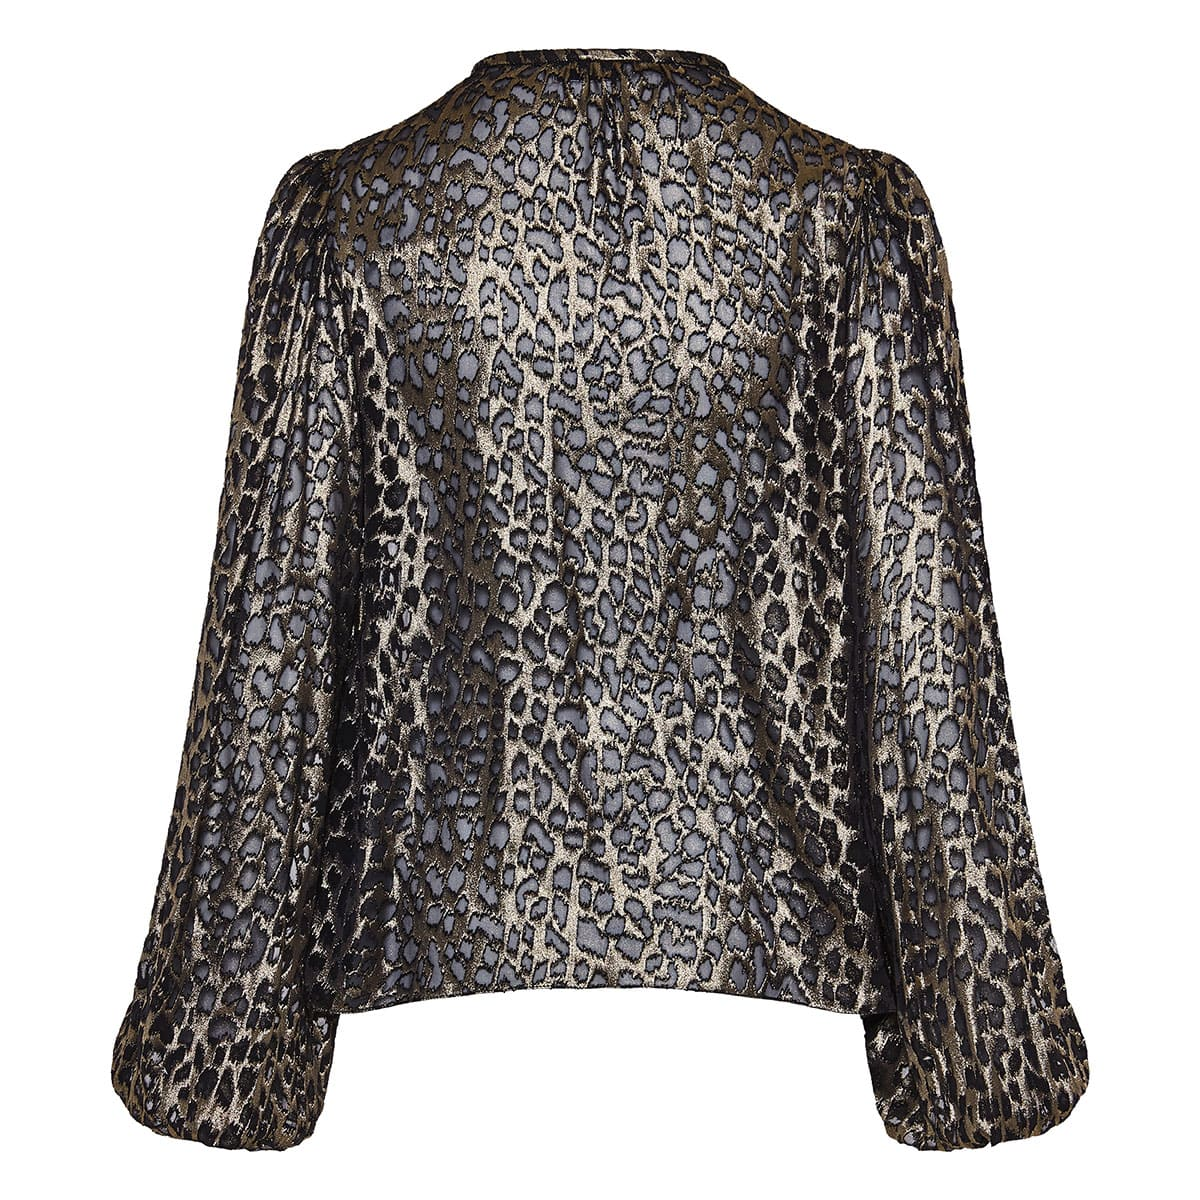 Metallic leopard semi-sheer blouse